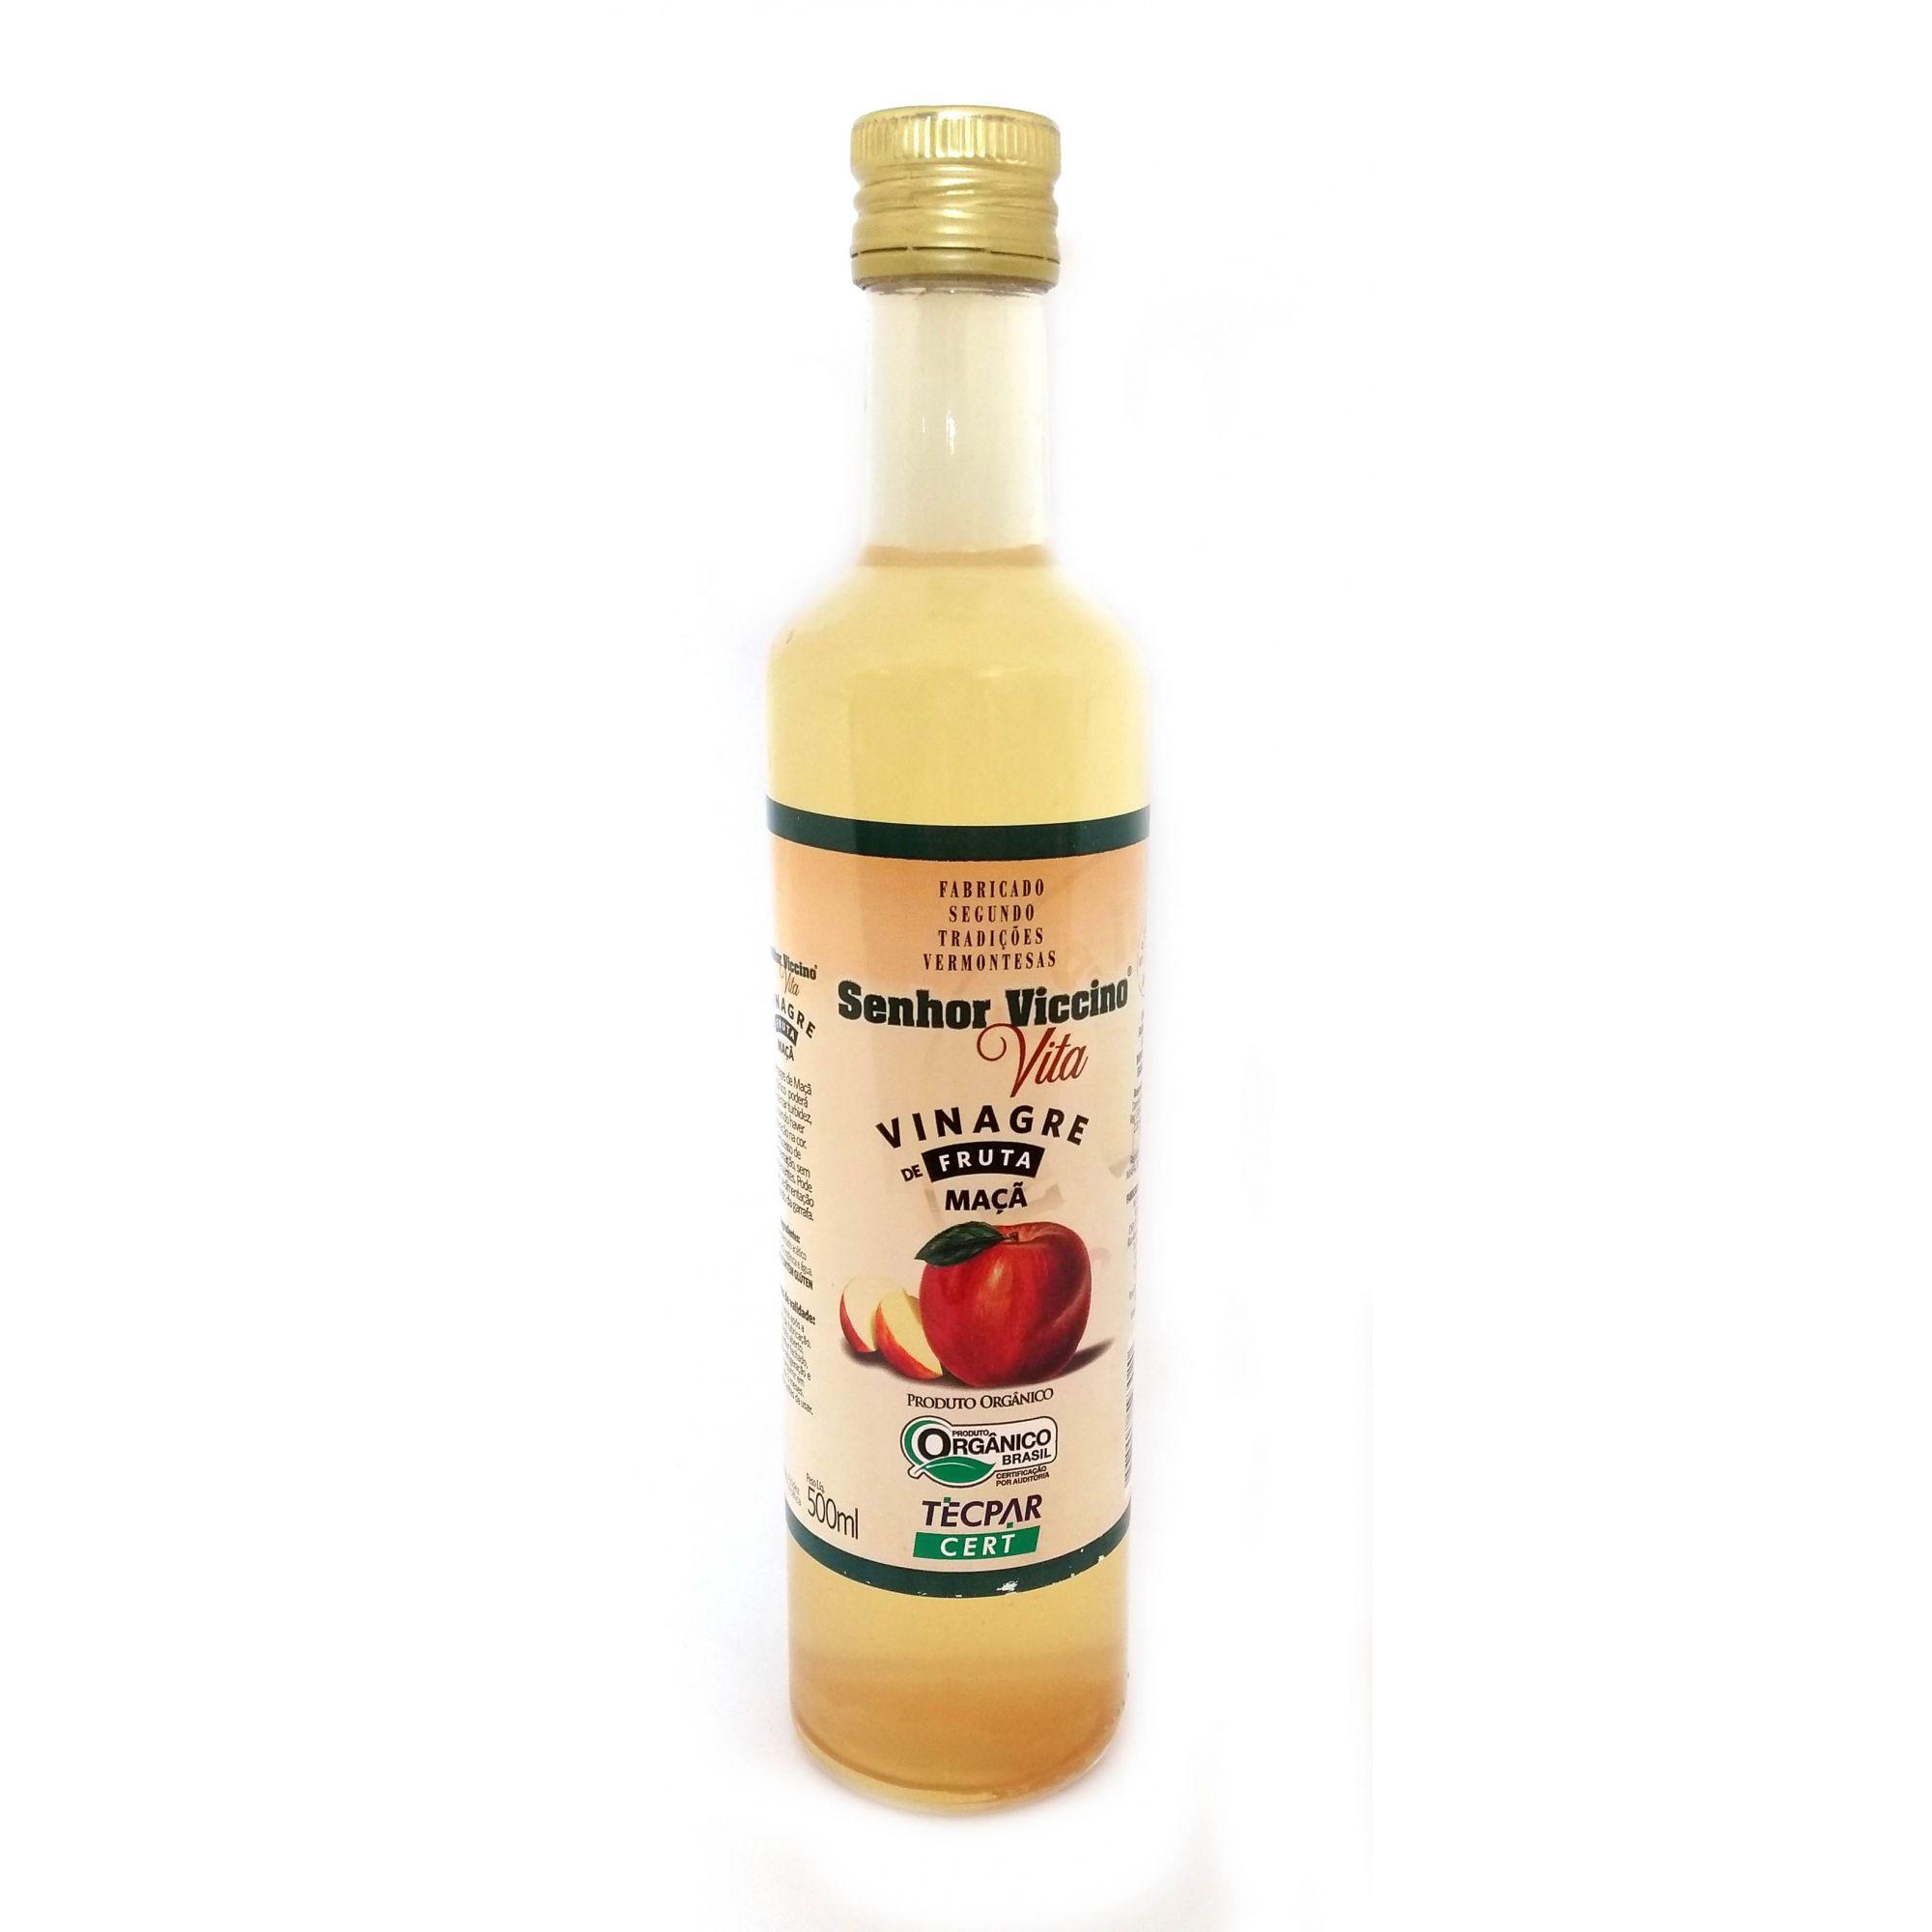 Senhor Viccino - Vinagre de Maçã Orgânico - 500ml